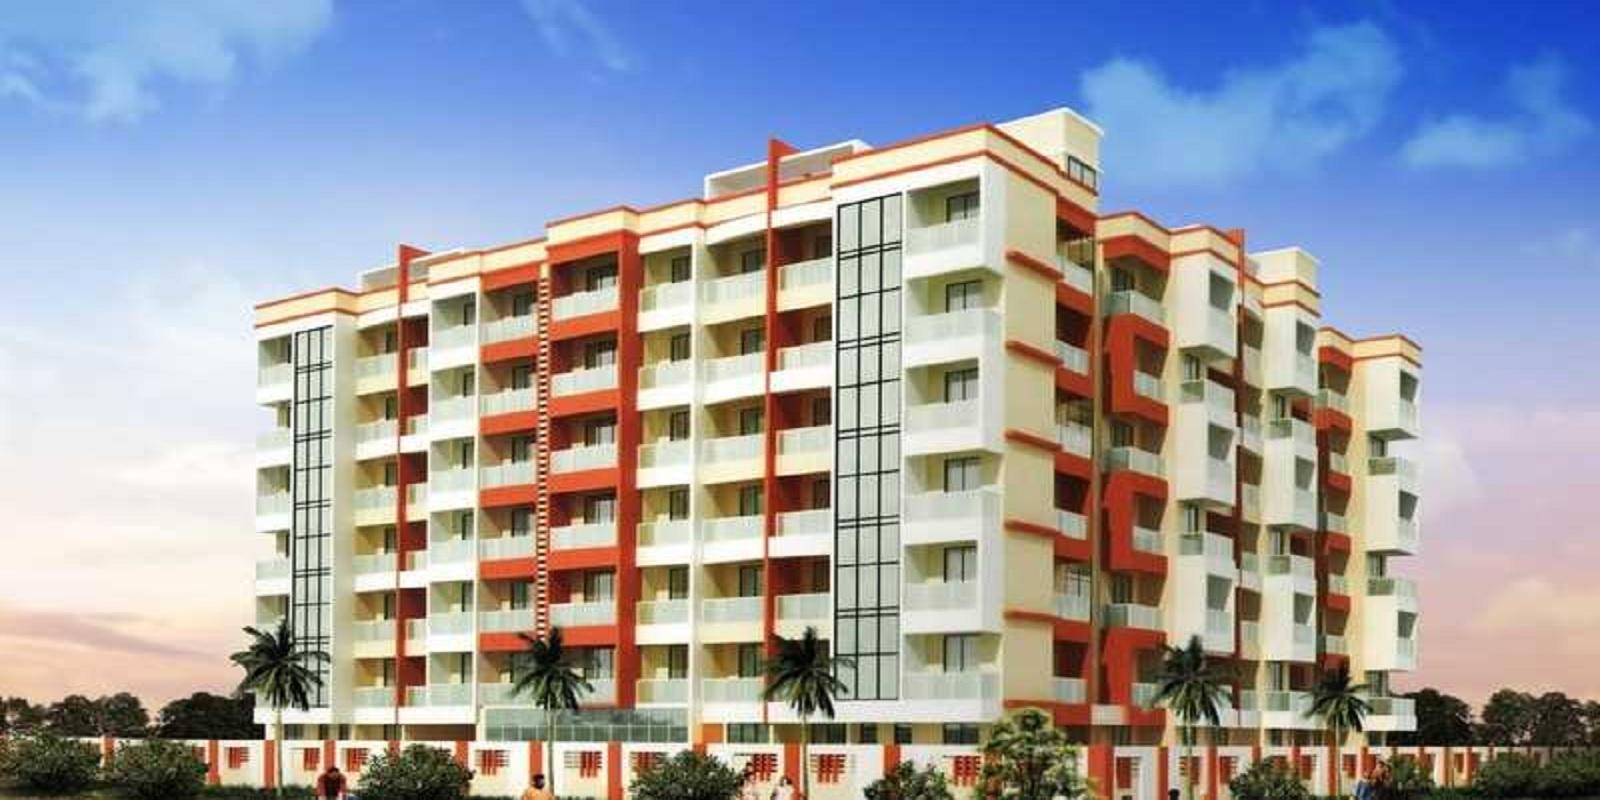 hitesh parasiya complex project project large image1